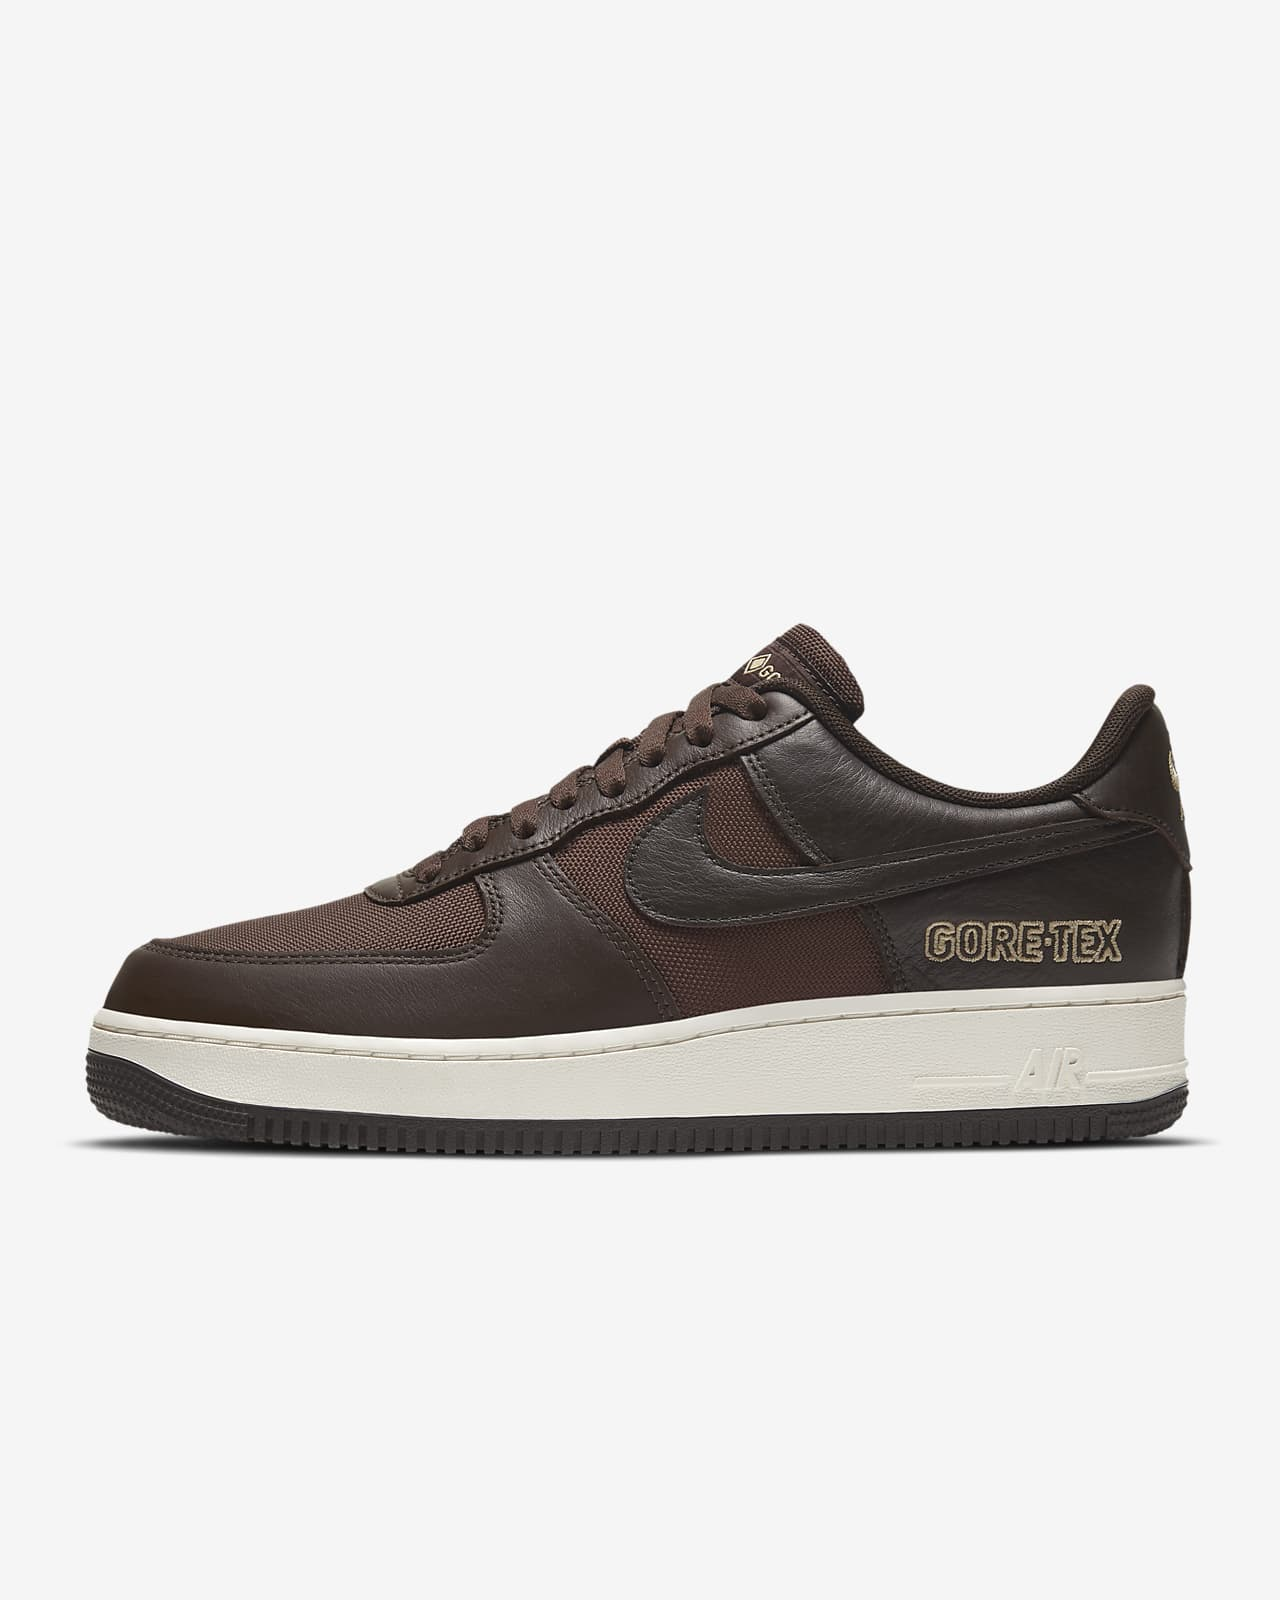 Nike Air Force 1 GTX Men's Shoe